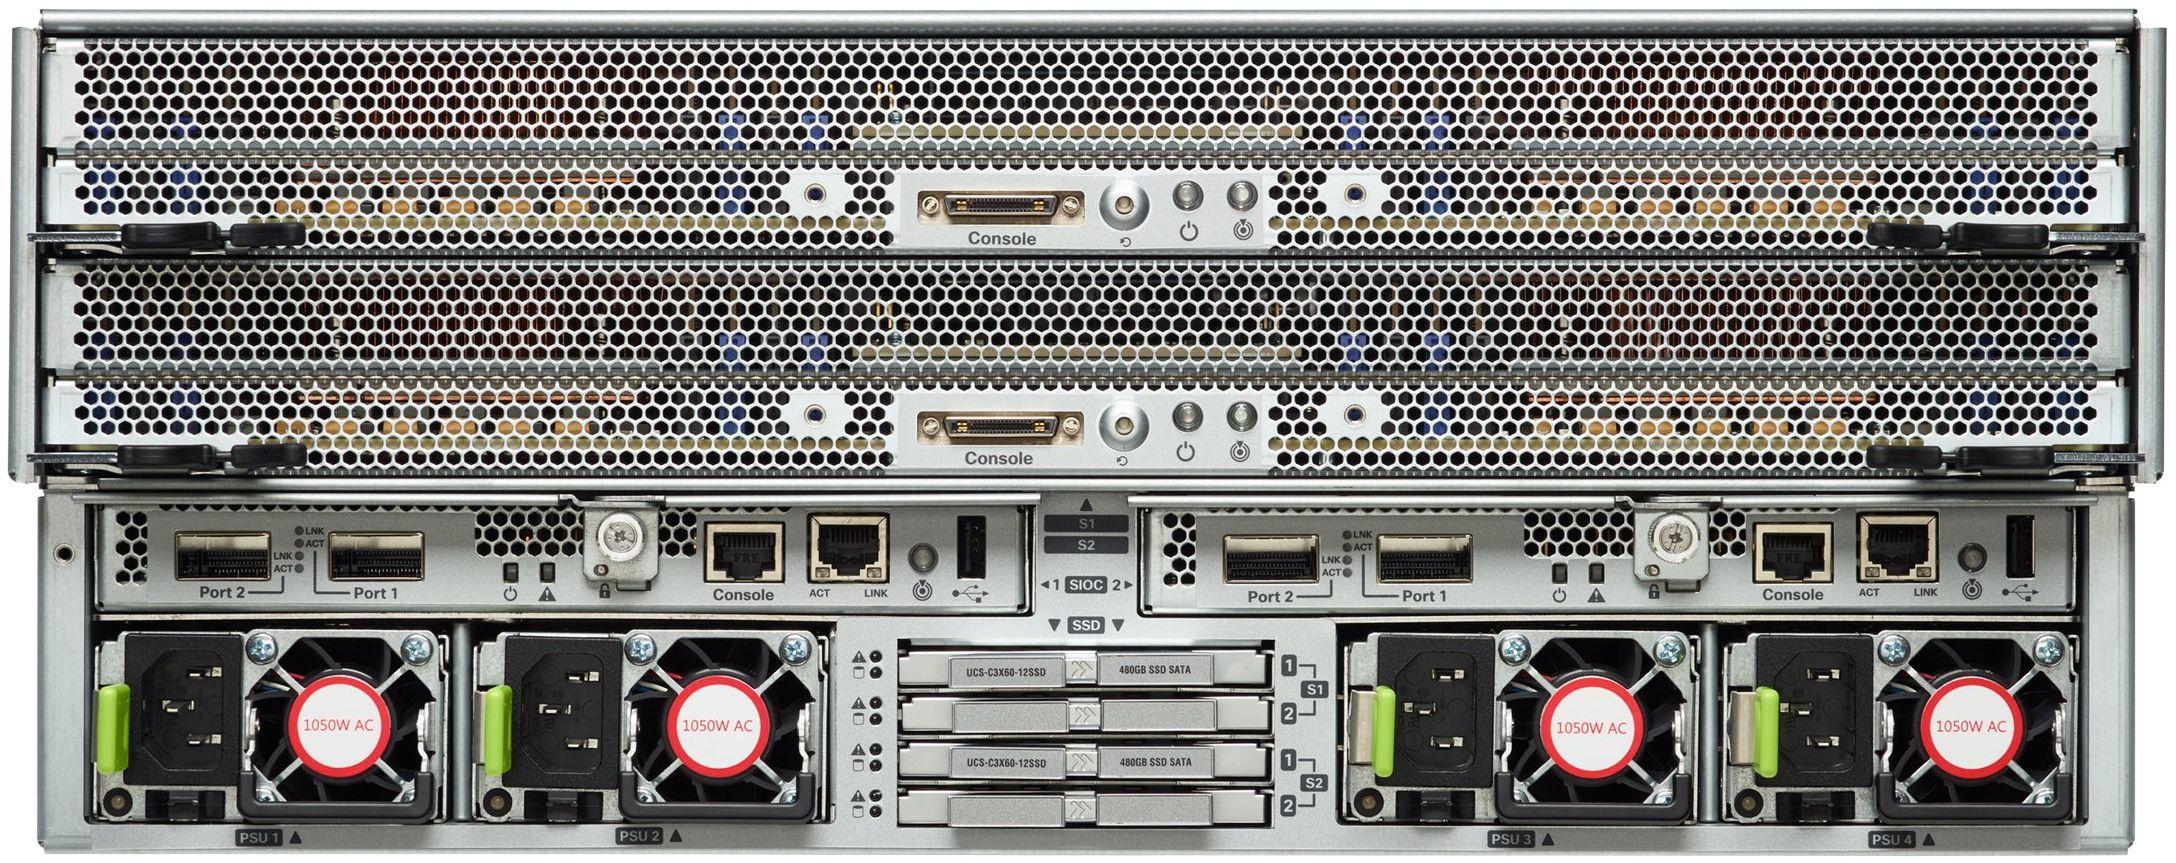 Cisco UCS C3260 Rear